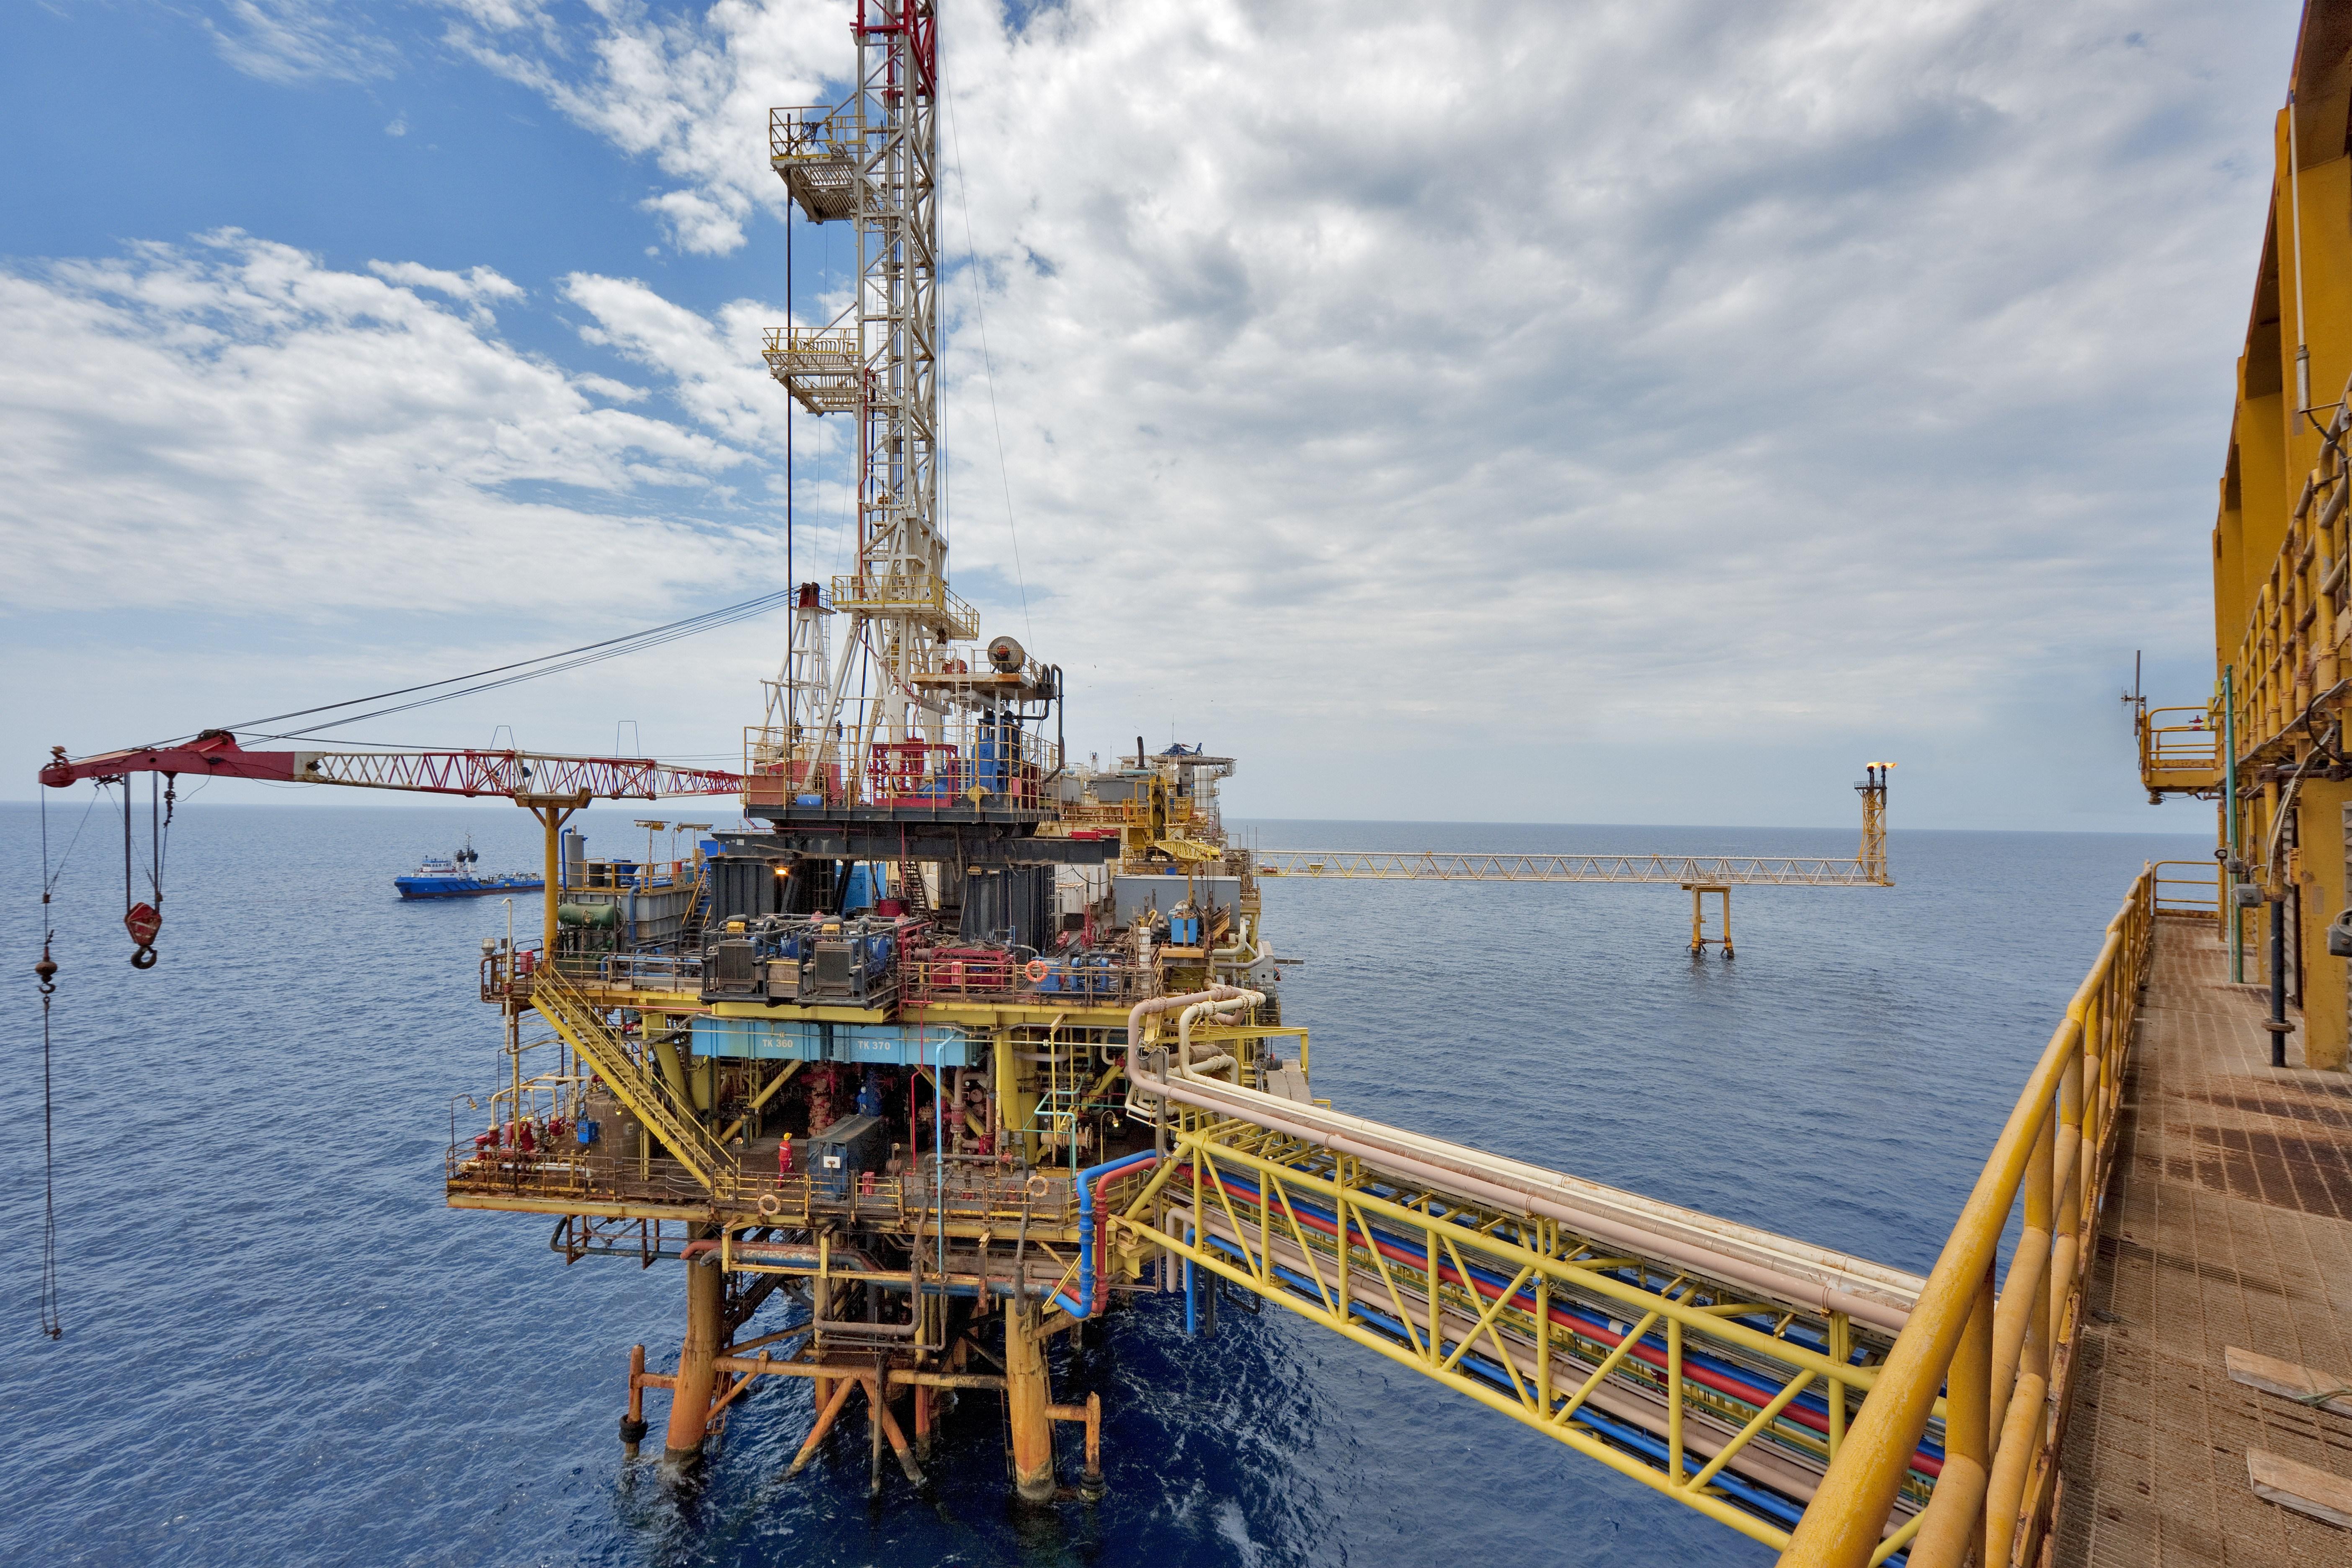 Bulgaria preparing to open tender for offshore oil, gas exploration permit